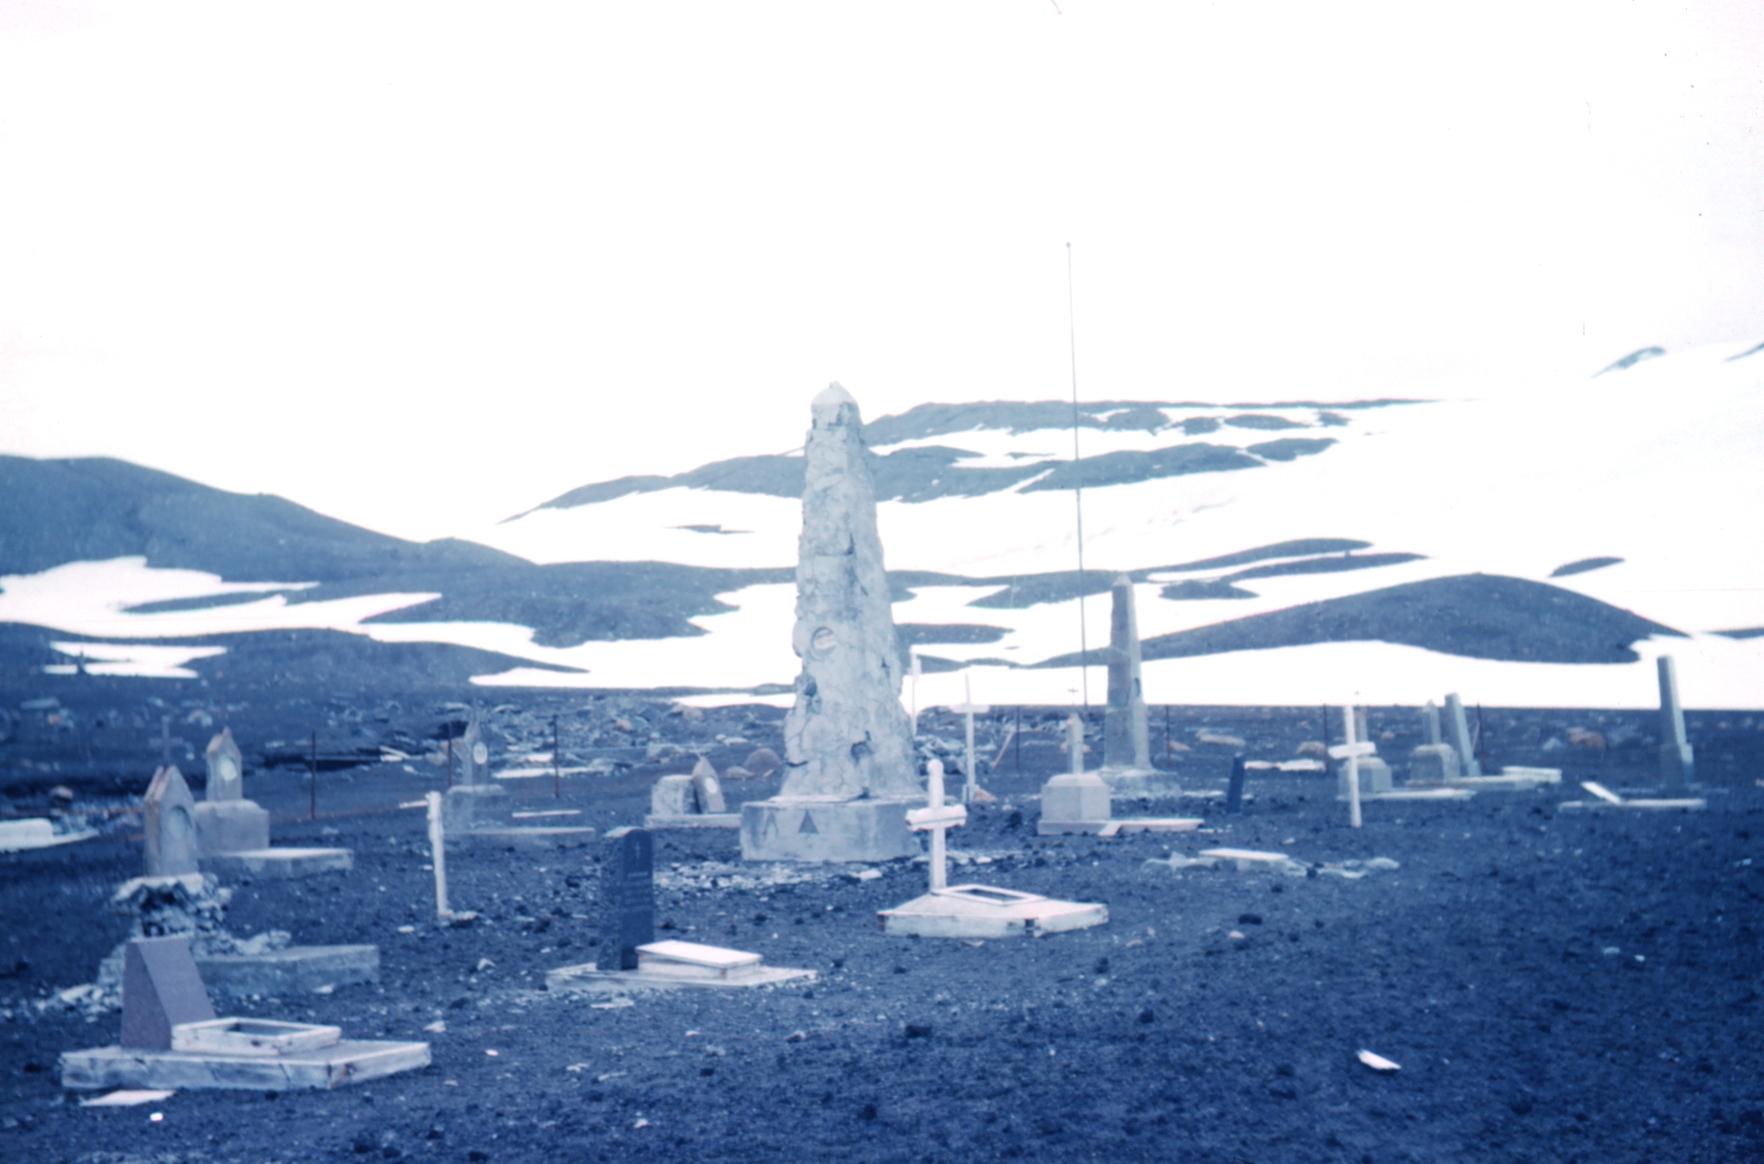 Whalers Cemetery on Deception Islandevahalloween